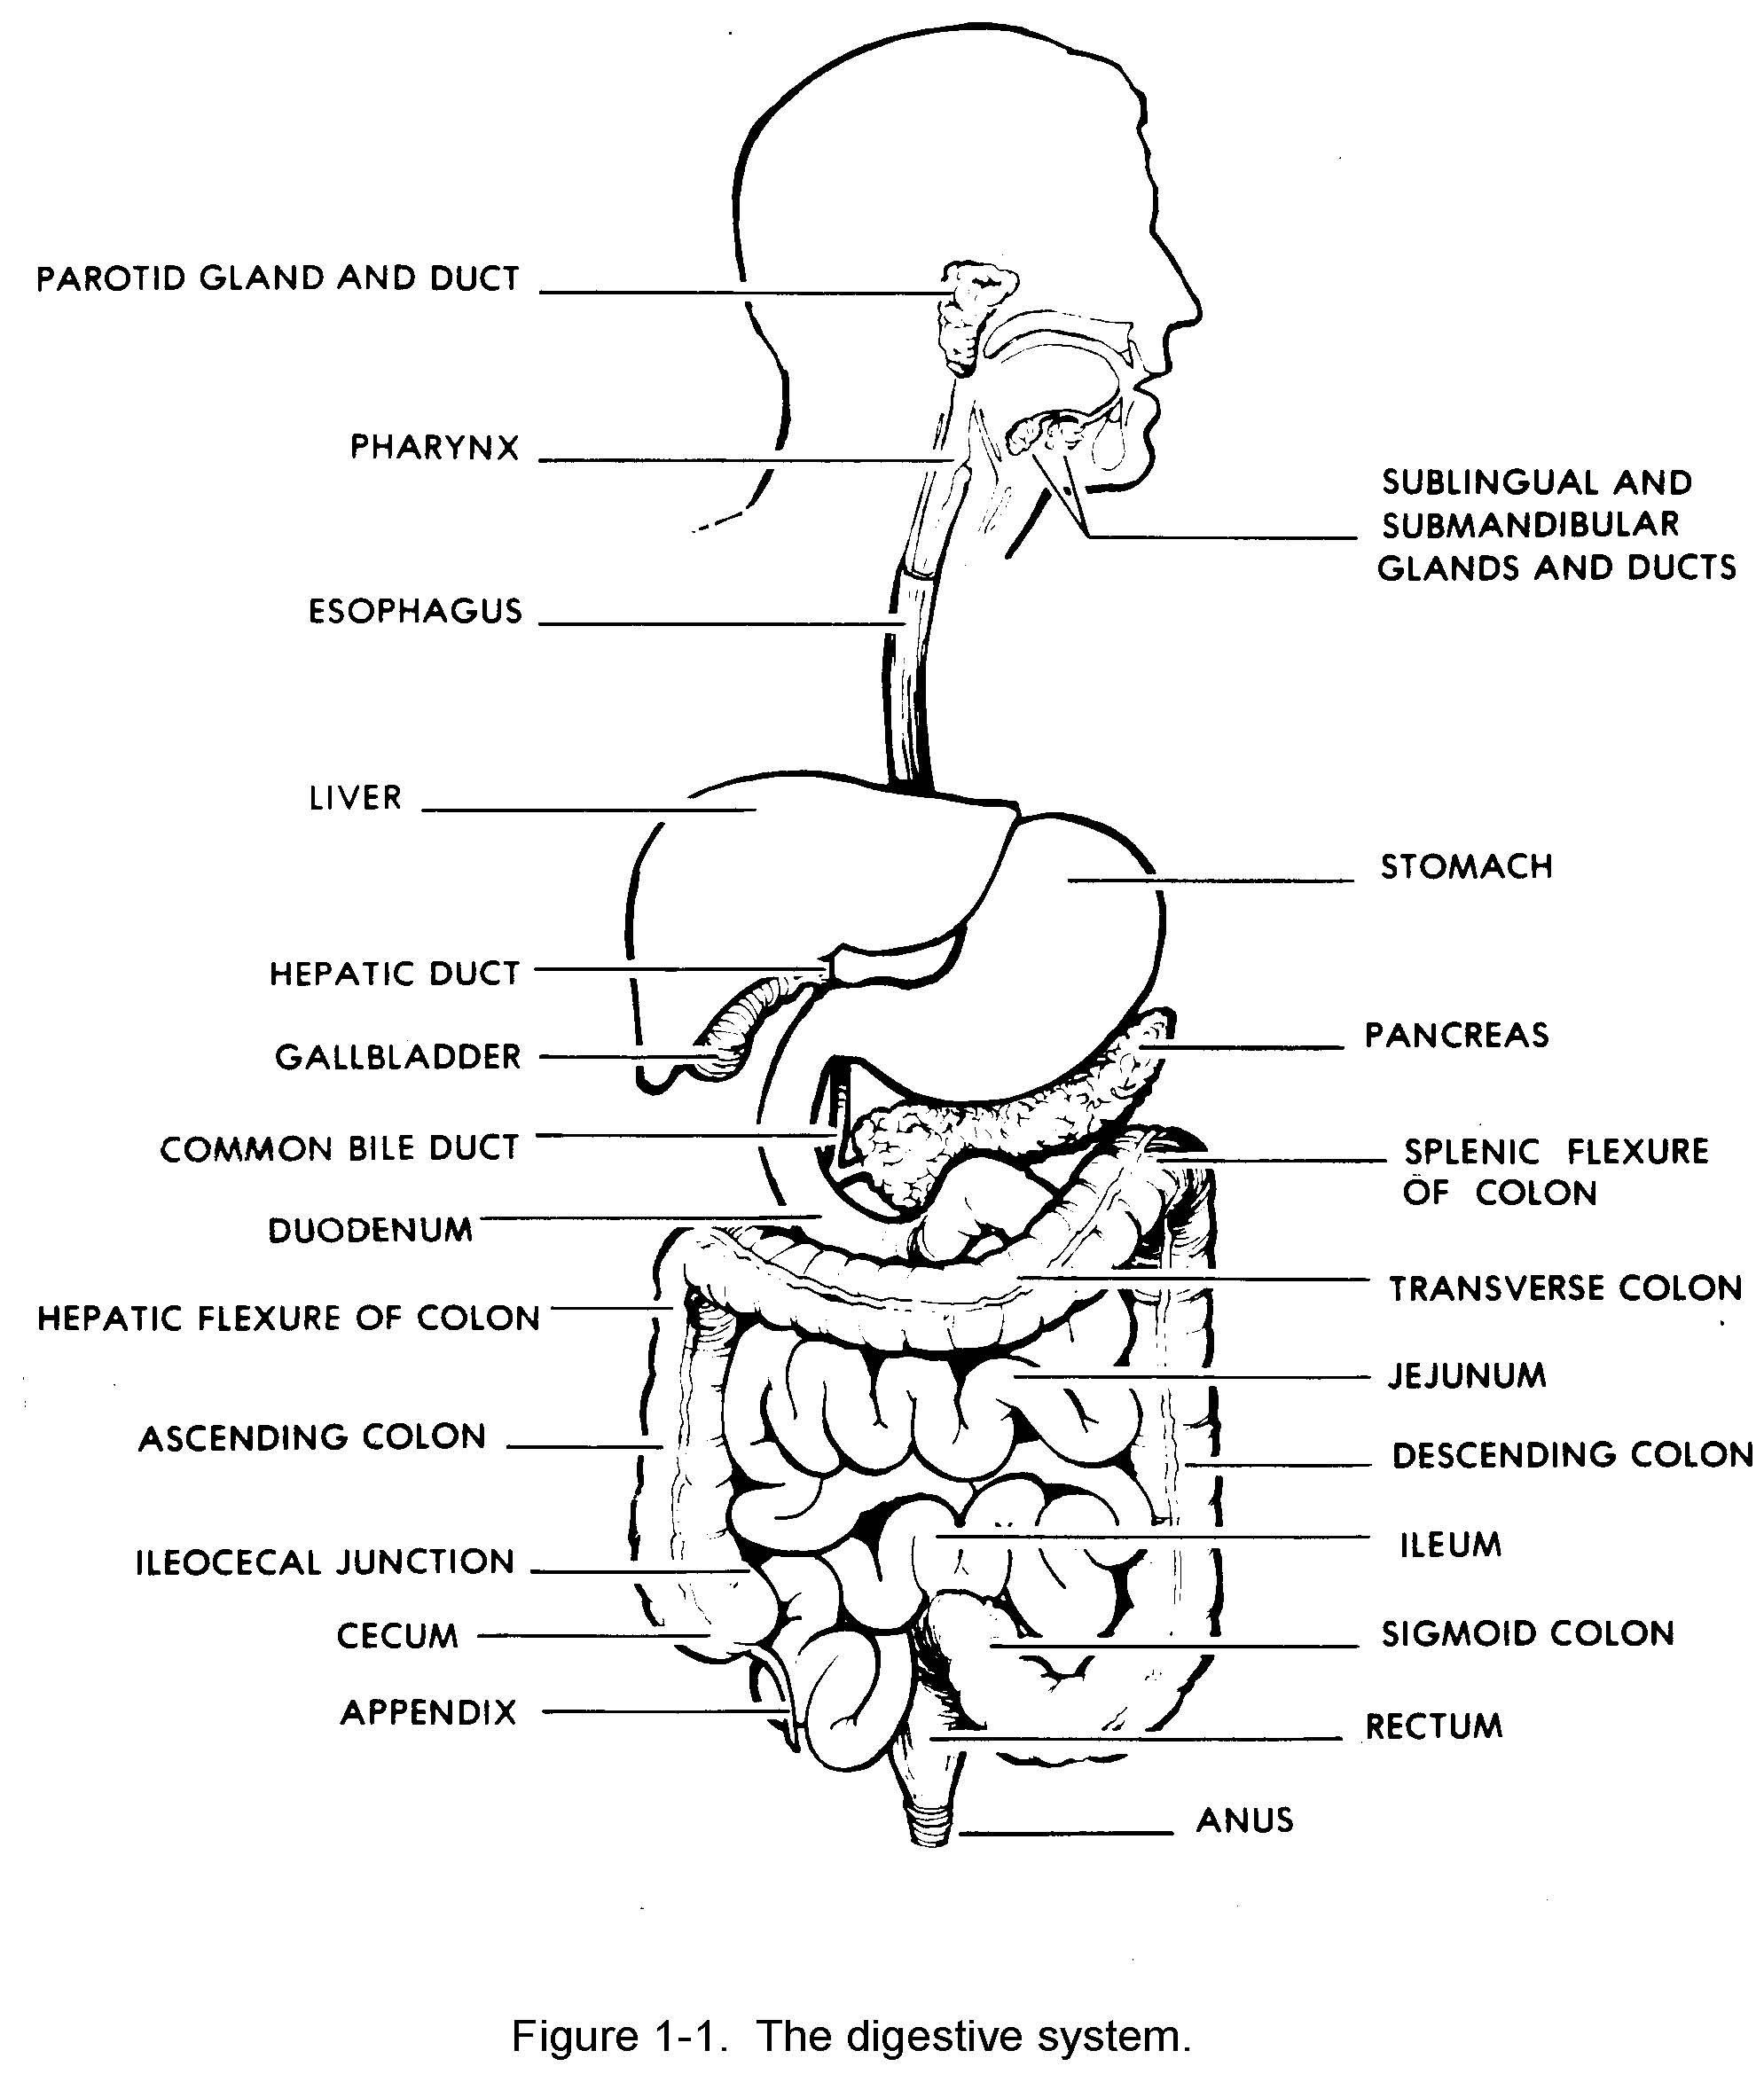 Digestive System Diagram To Label   Digestive System